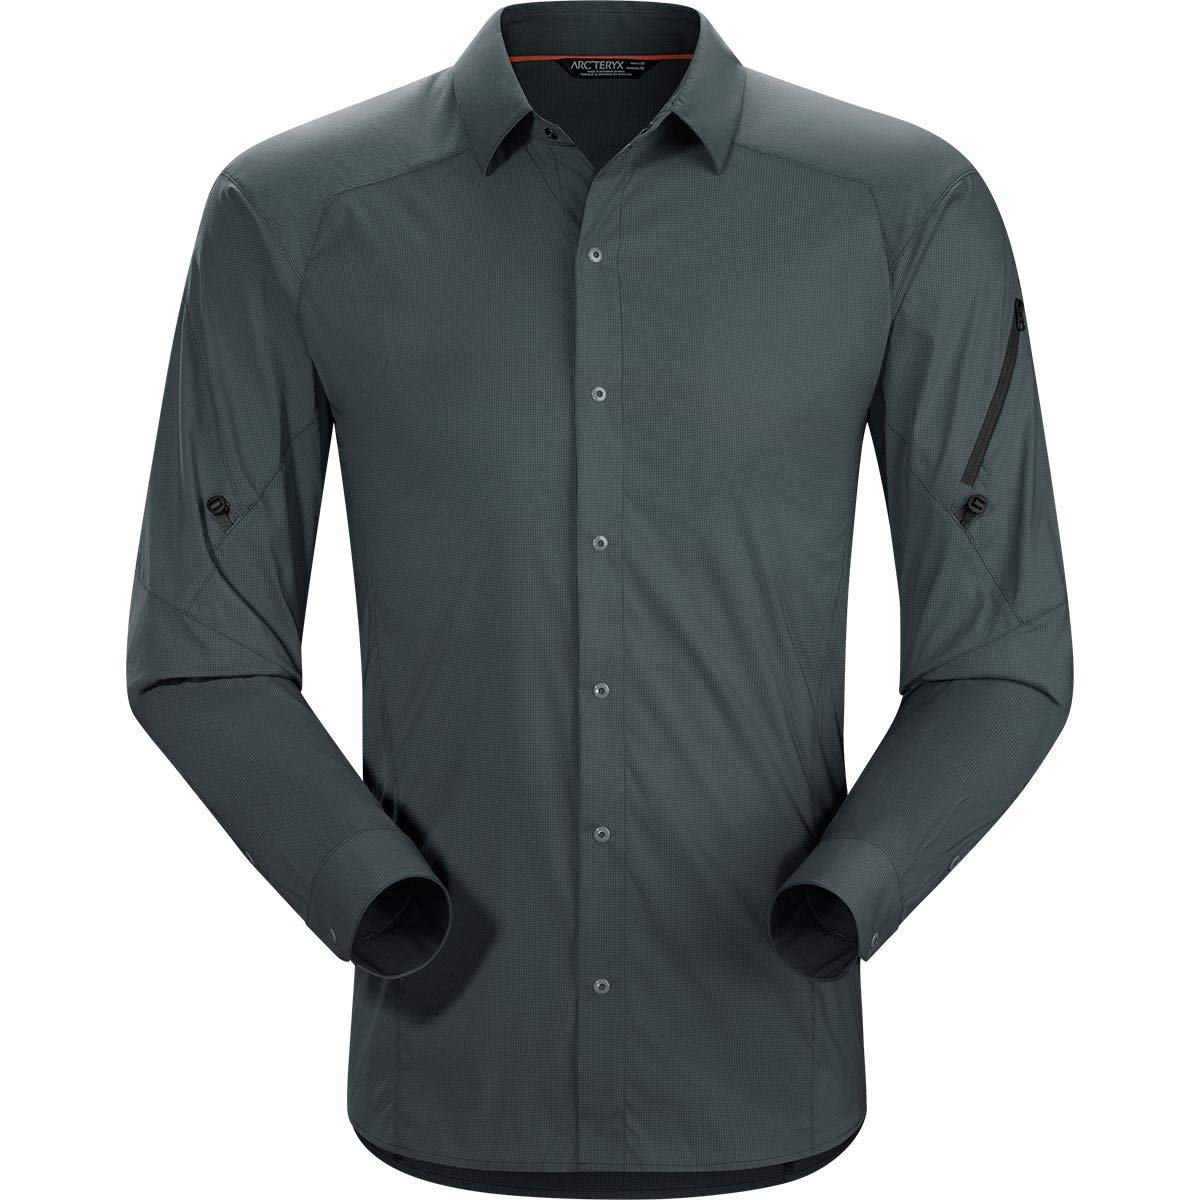 ARC'TERYX(アークテリクス) Elaho LS Shirt Men's イラオ LS シャツ メンズ 13652 磁石 S